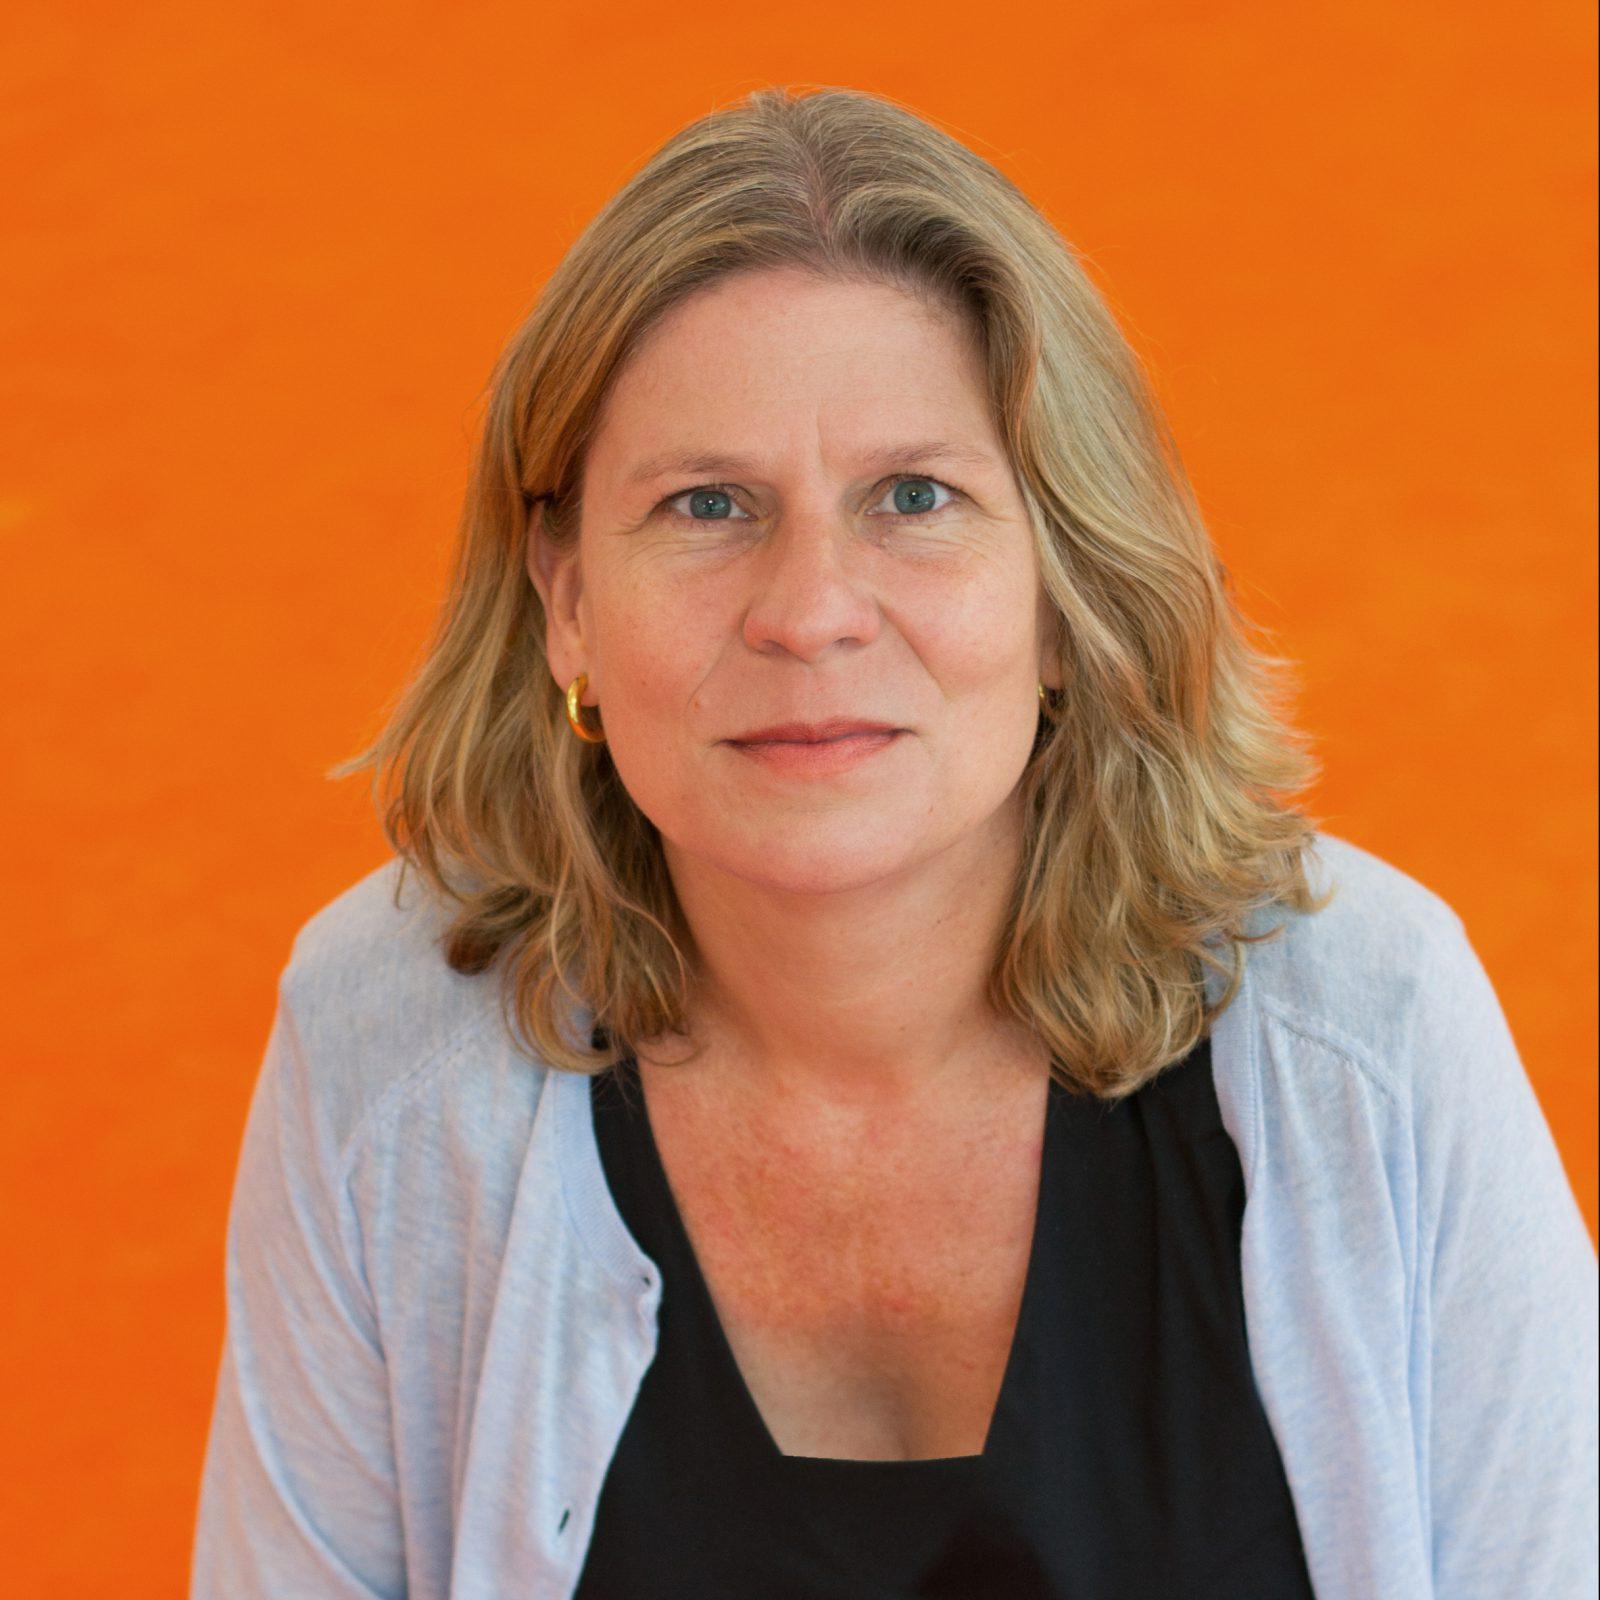 Chantal Kemner, hoofdonderzoeker van YOUth